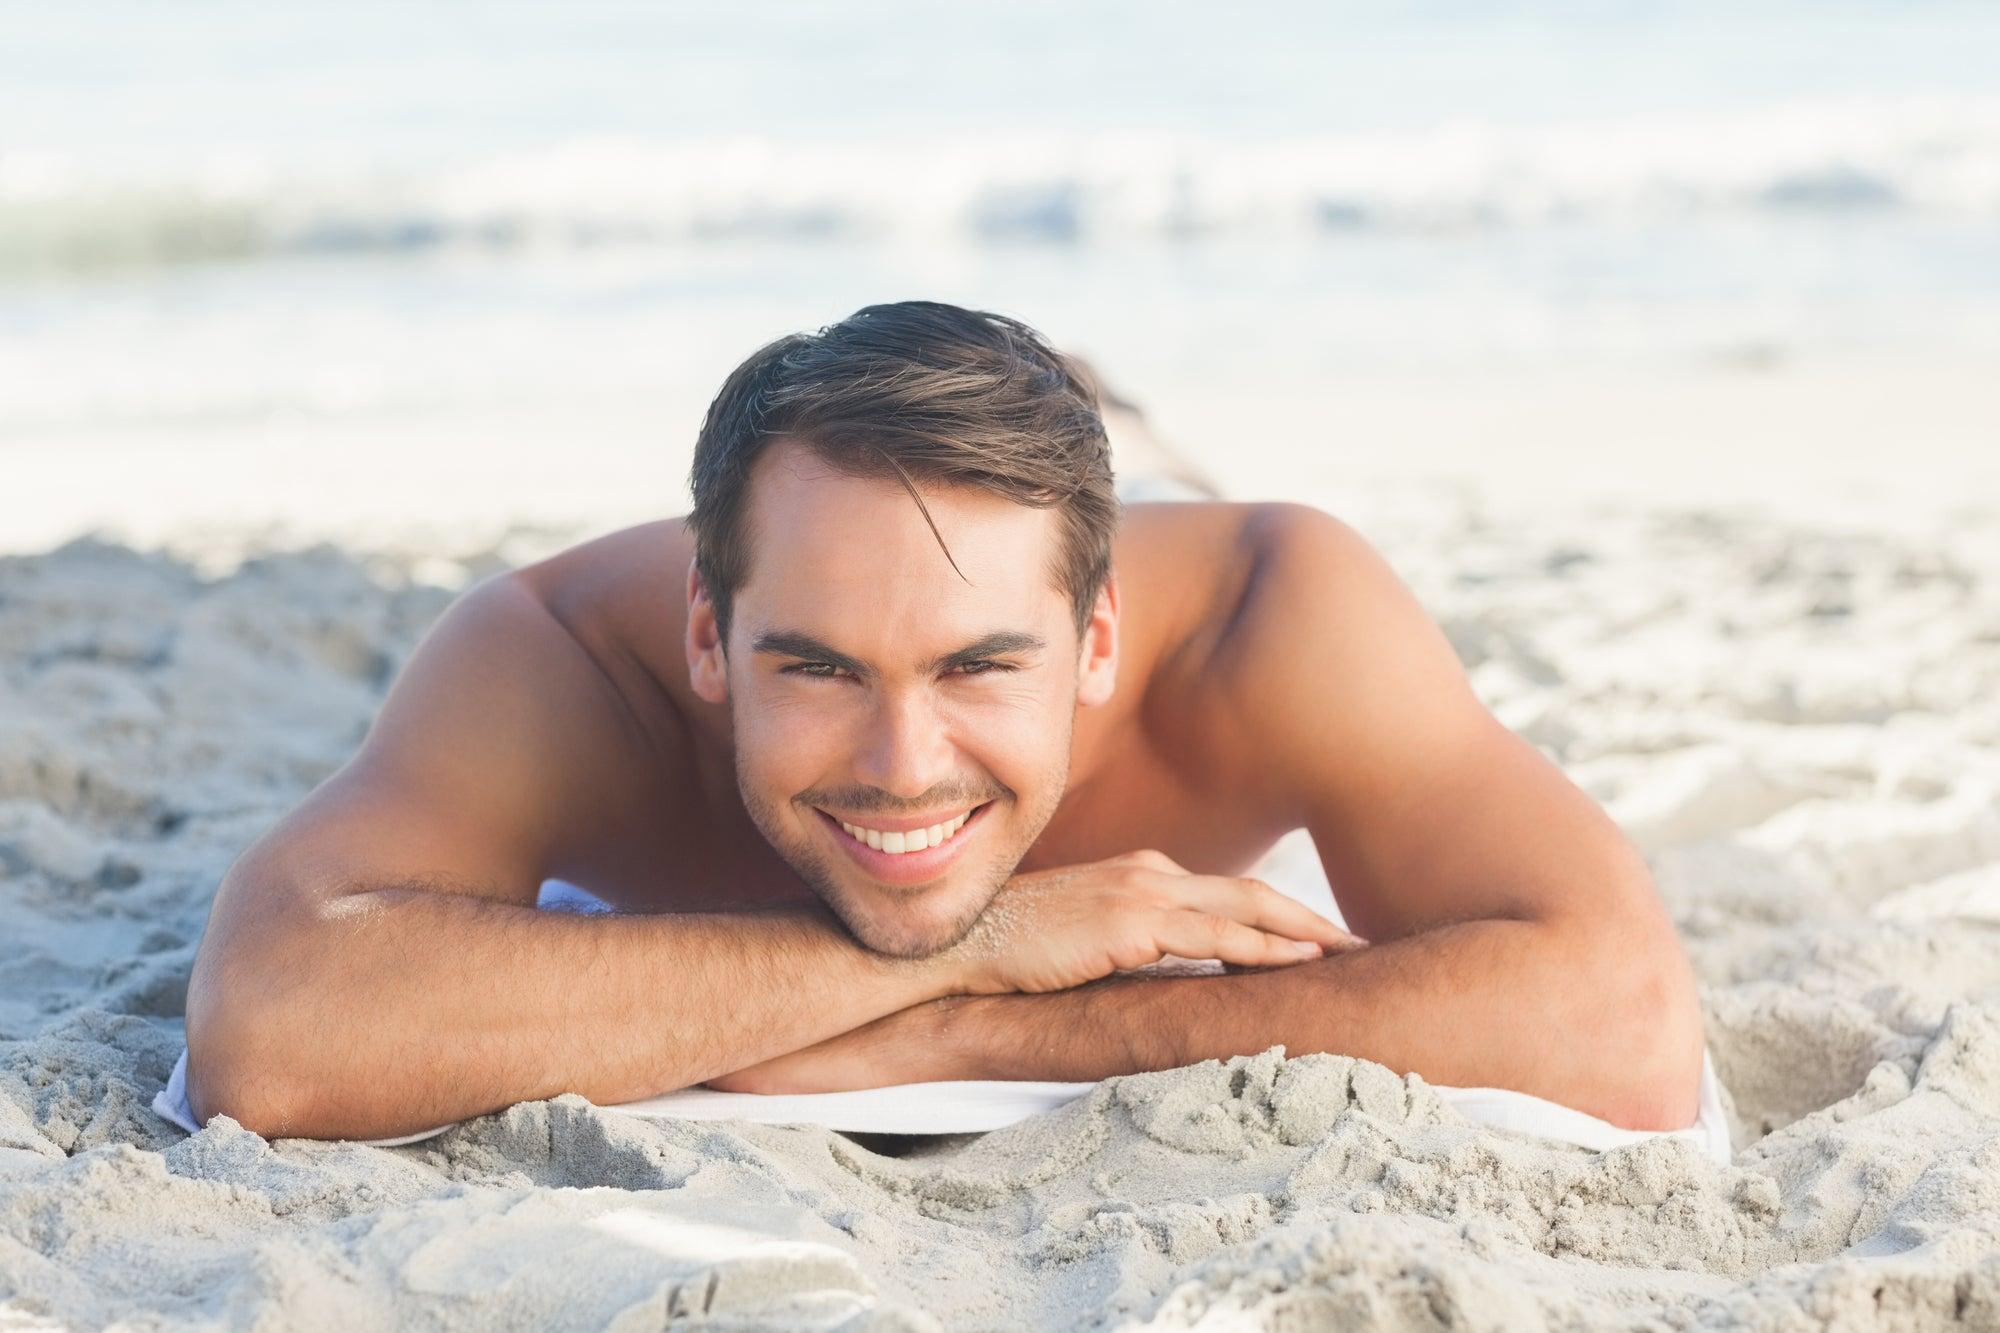 Nude Beach Anal Tumblr